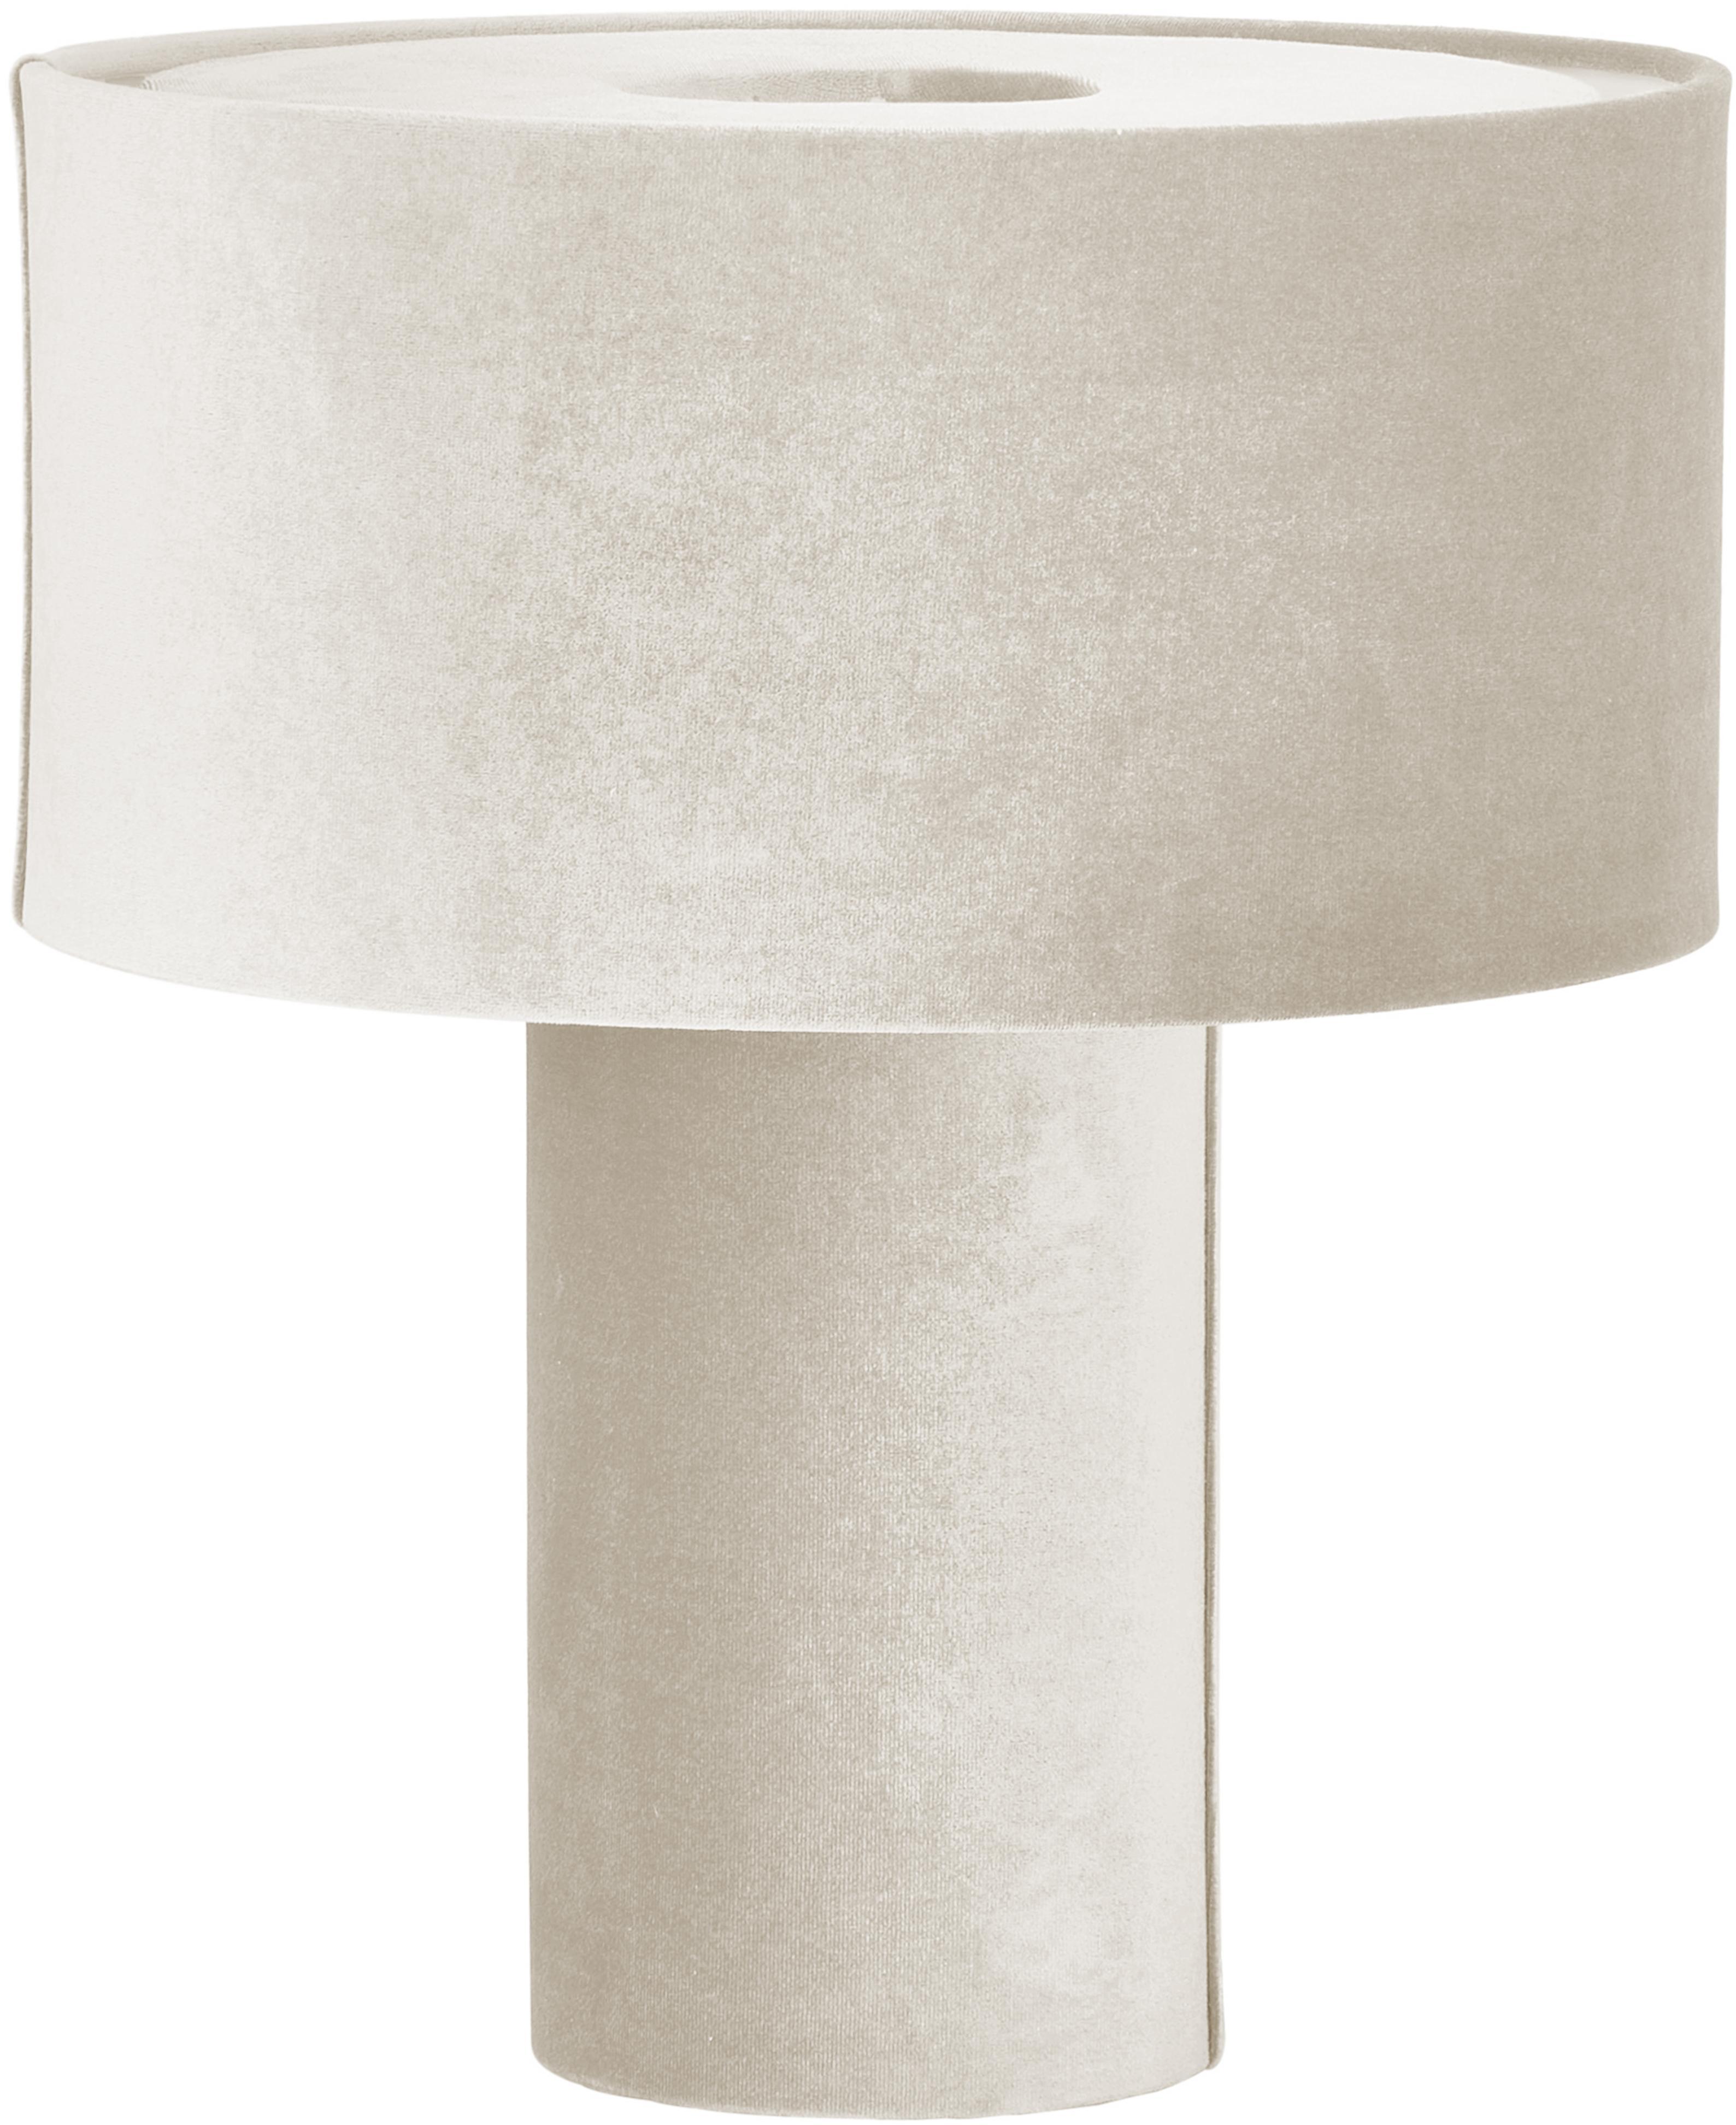 Fluwelen tafellamp Frida, Lampvoet: kunststof met fluwelen be, Lampenkap: fluweel, Diffuser: fluweel, Lichtgrijs, Ø 30 x H 36 cm